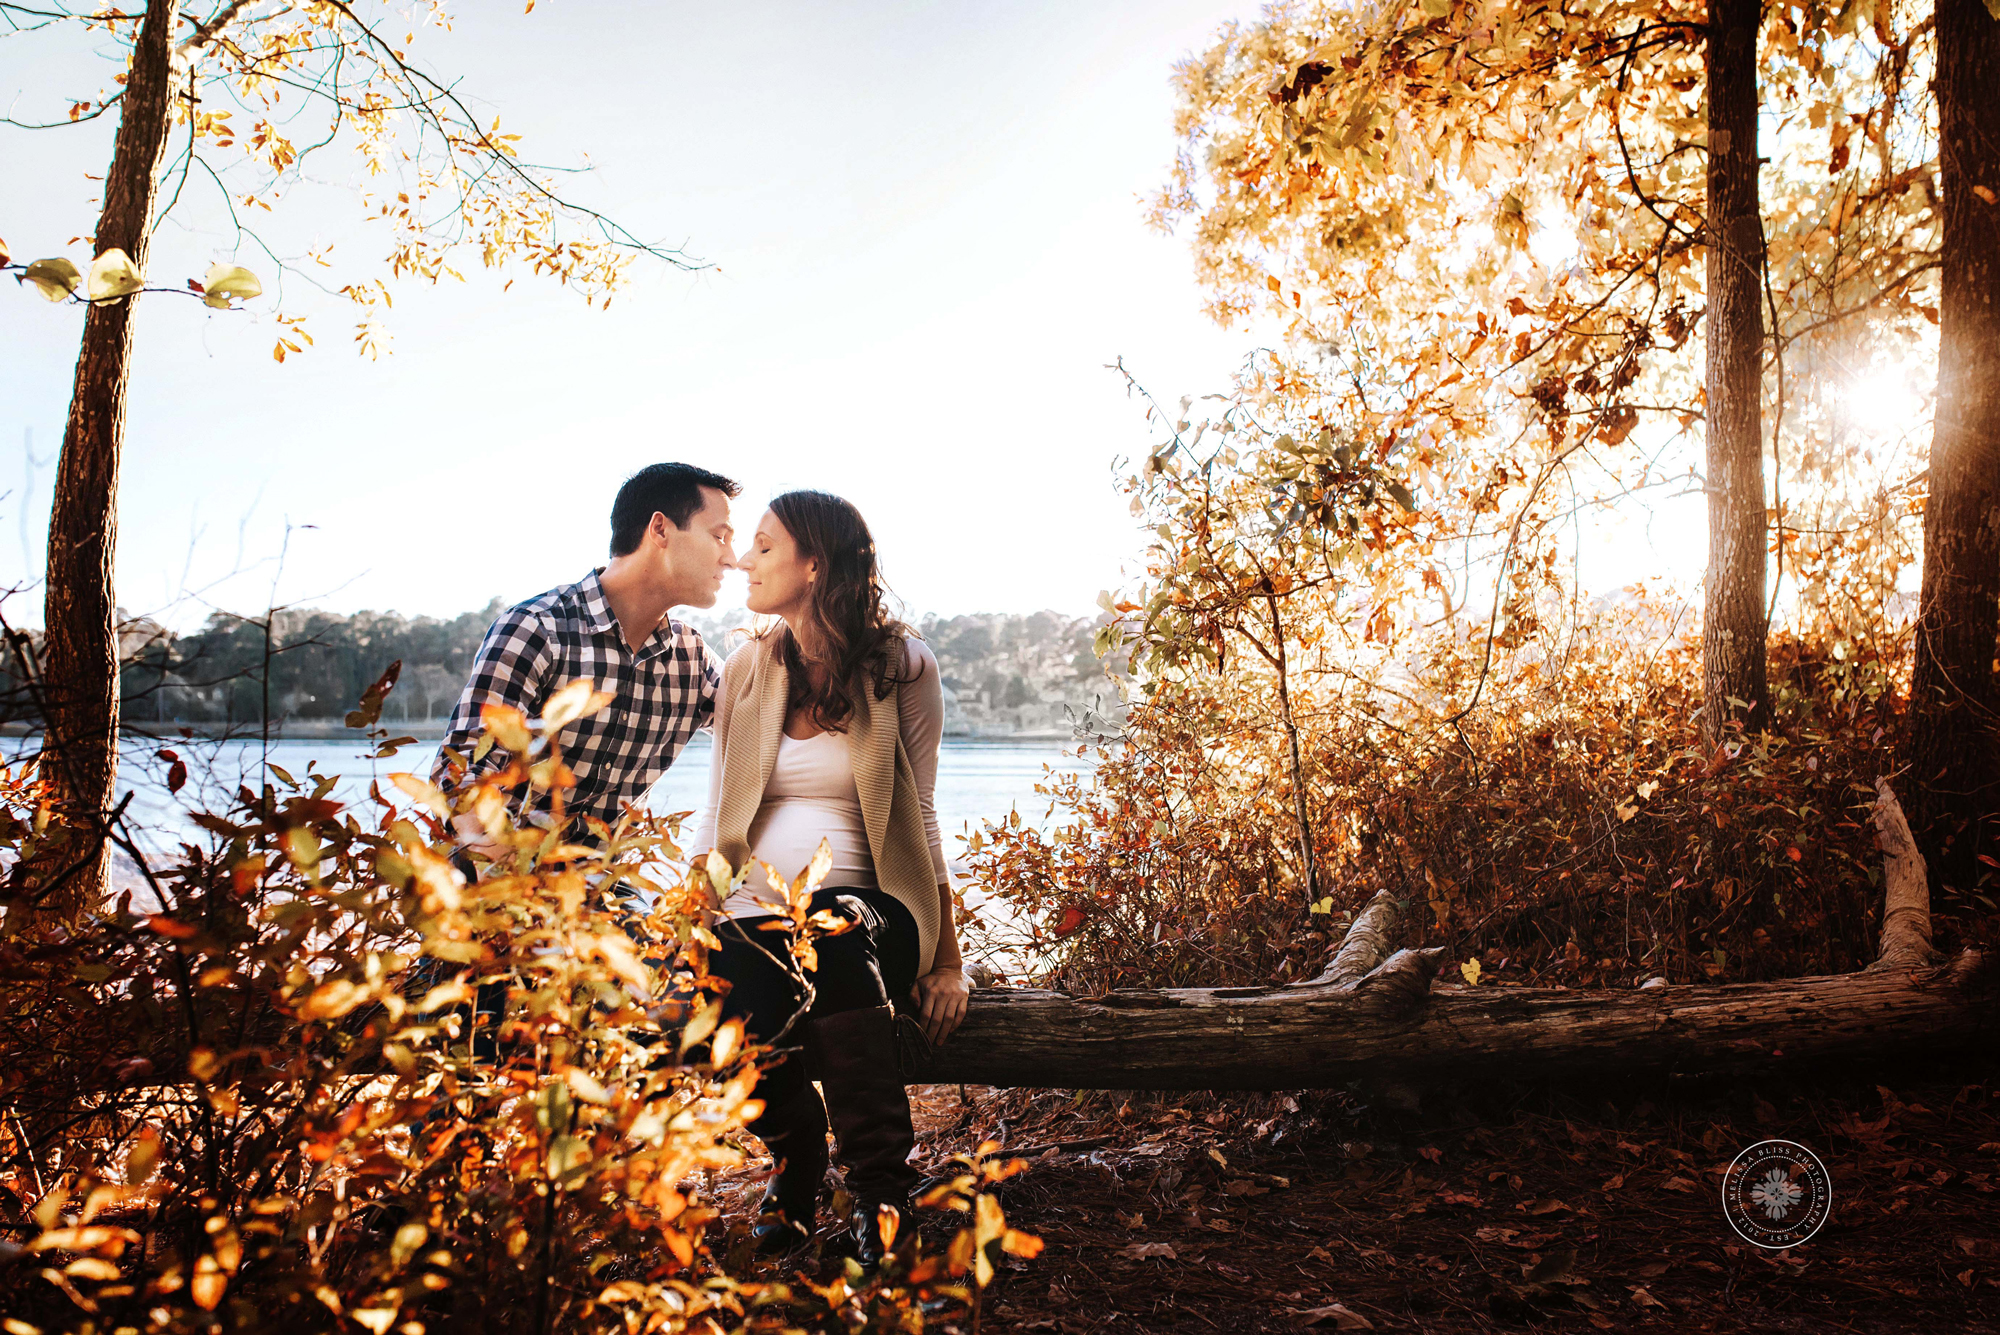 natural-posing-couples-maternity-session-fall-leaves-virginia-beach-va